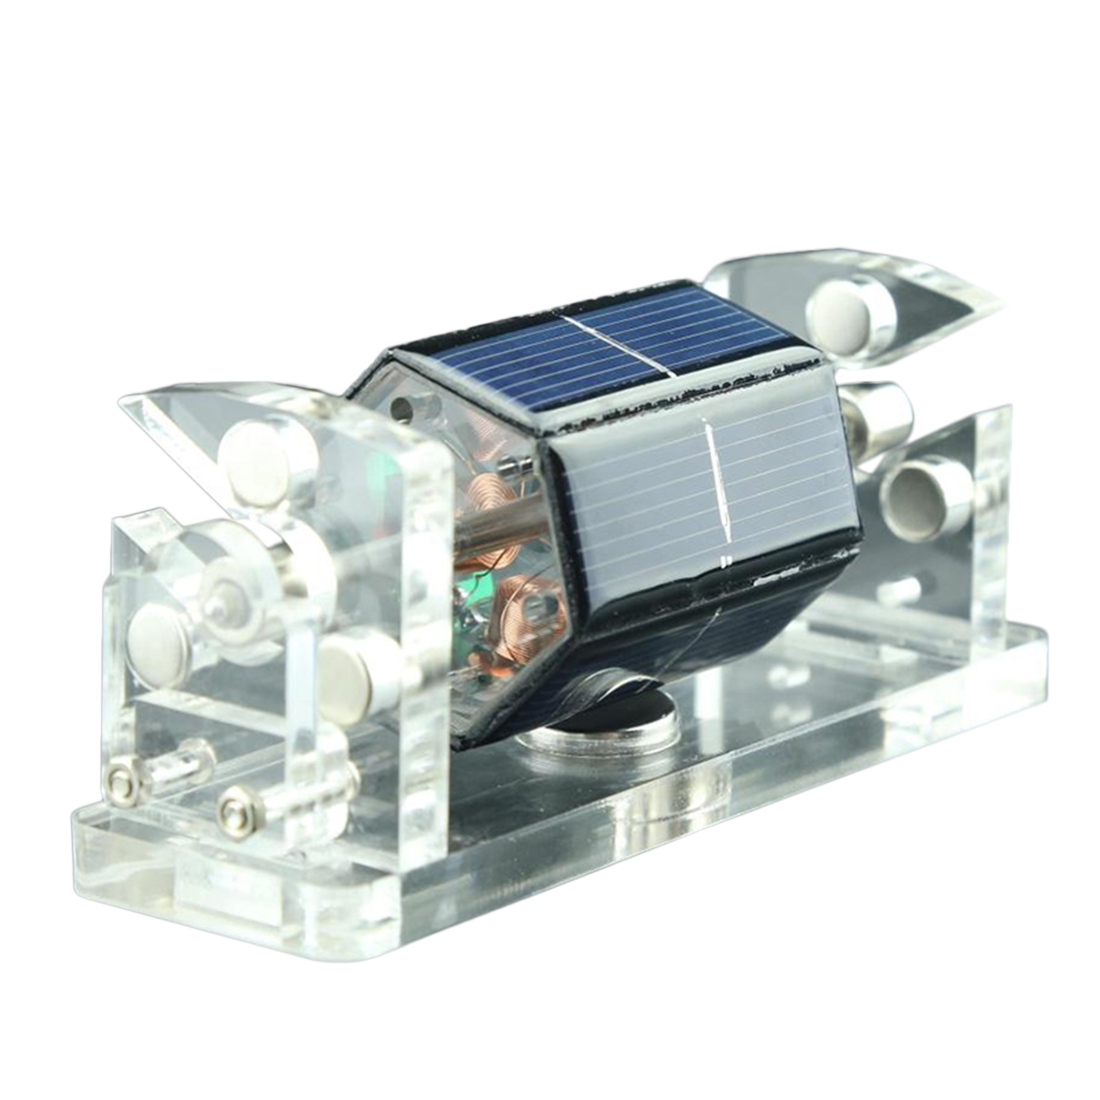 Hot Sale DIY Solar Magnetic Levitation Model Levitating Motor Brain-Training Toy For Children Kids Educational Toy Birthday Gift